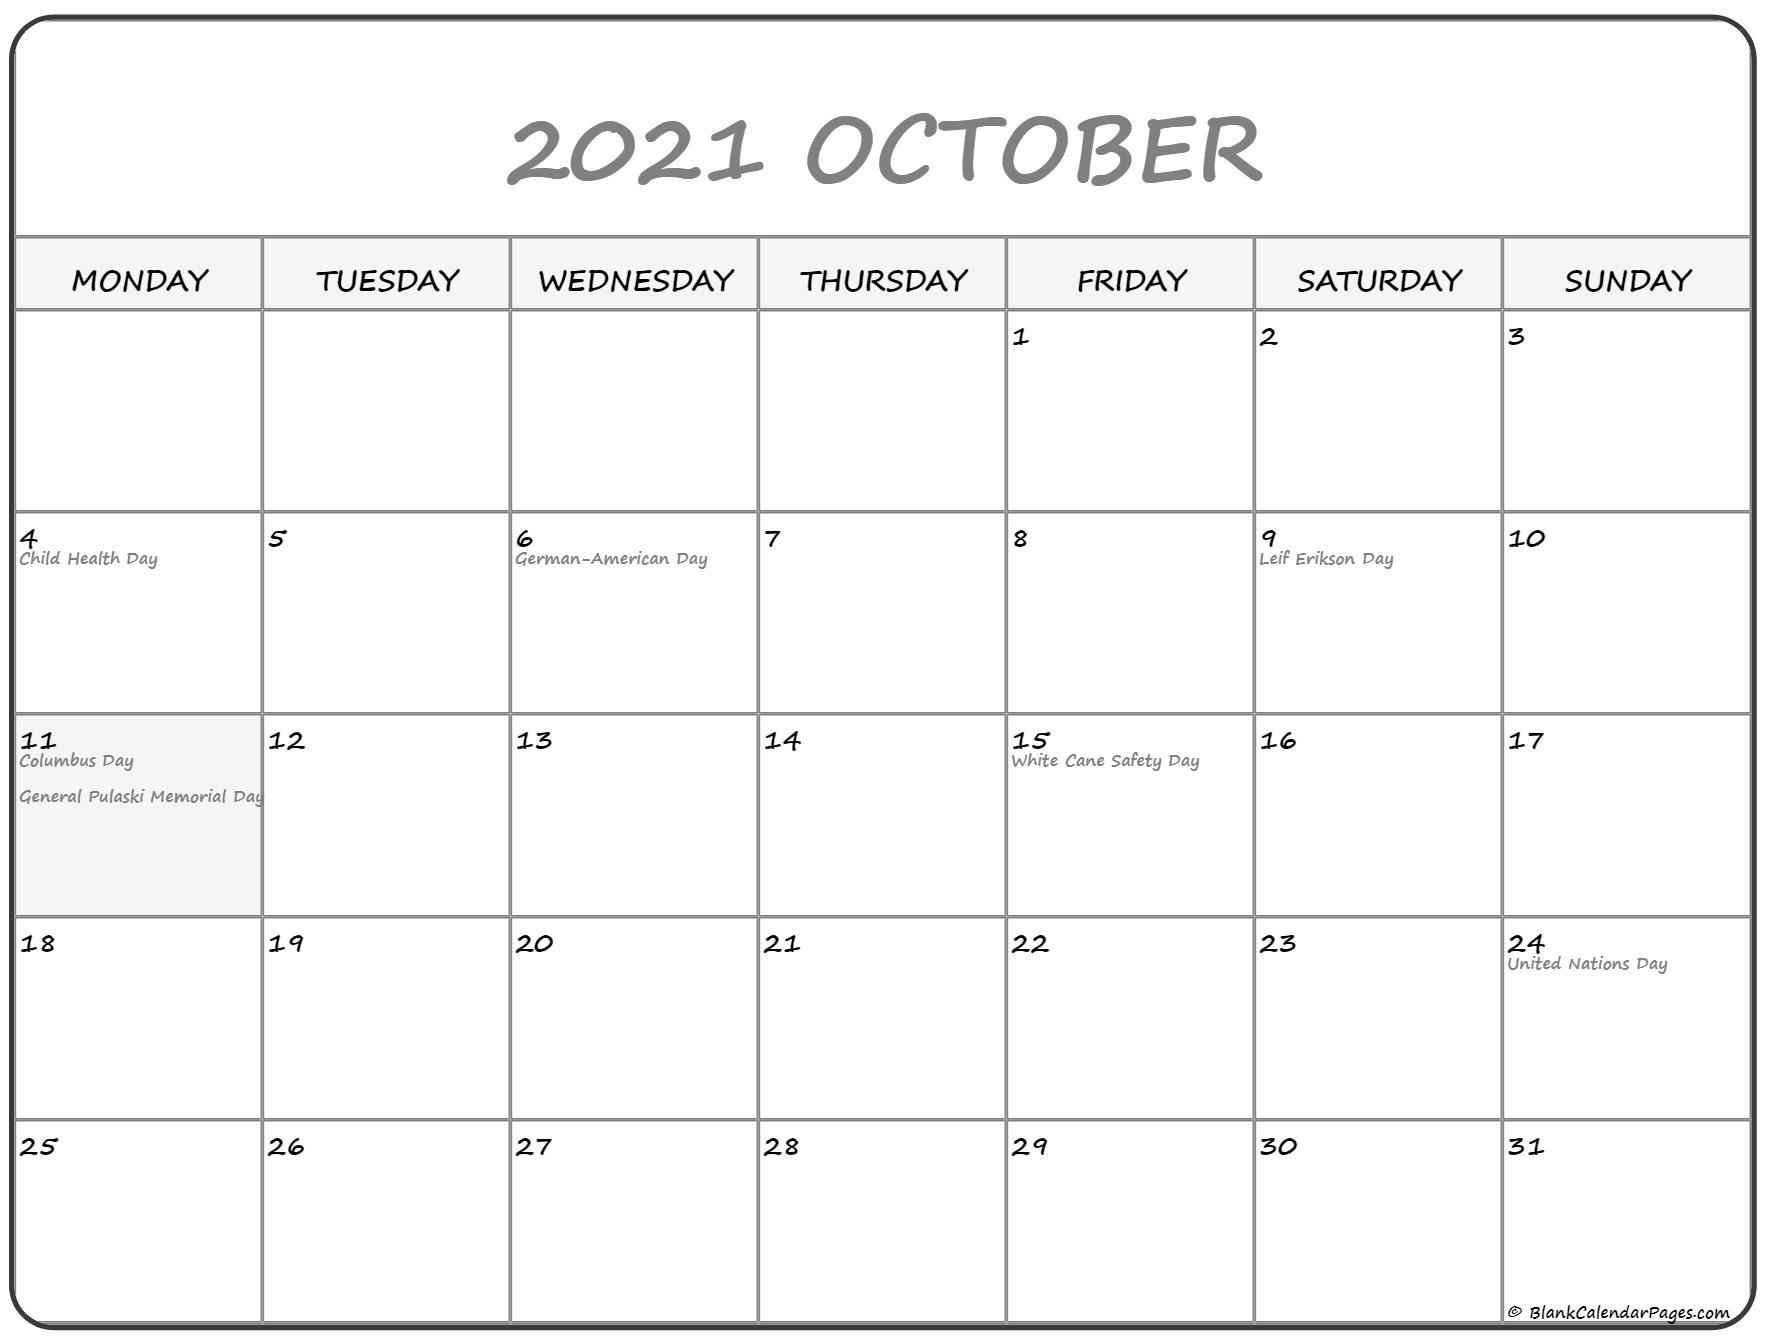 October 2021 Thru December 2021 Calendar | Calendar inside Calendar 2021 Monday Through Sunday